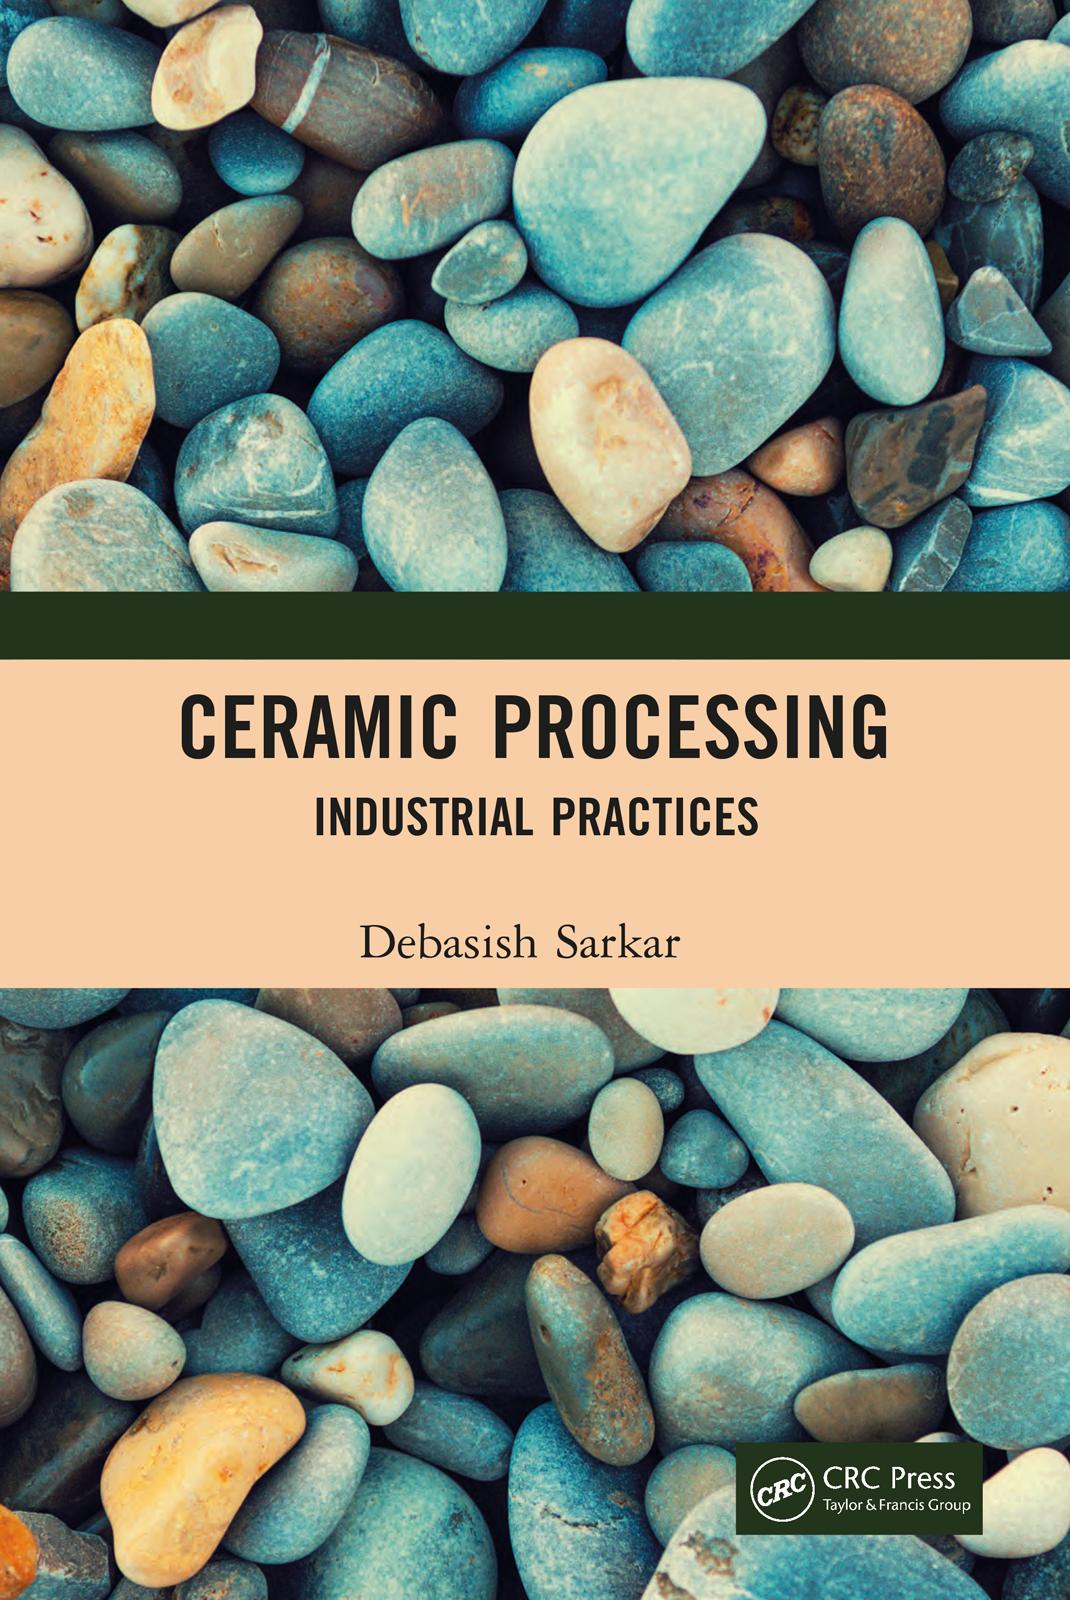 Ceramic Processing: Industrial Practices book cover